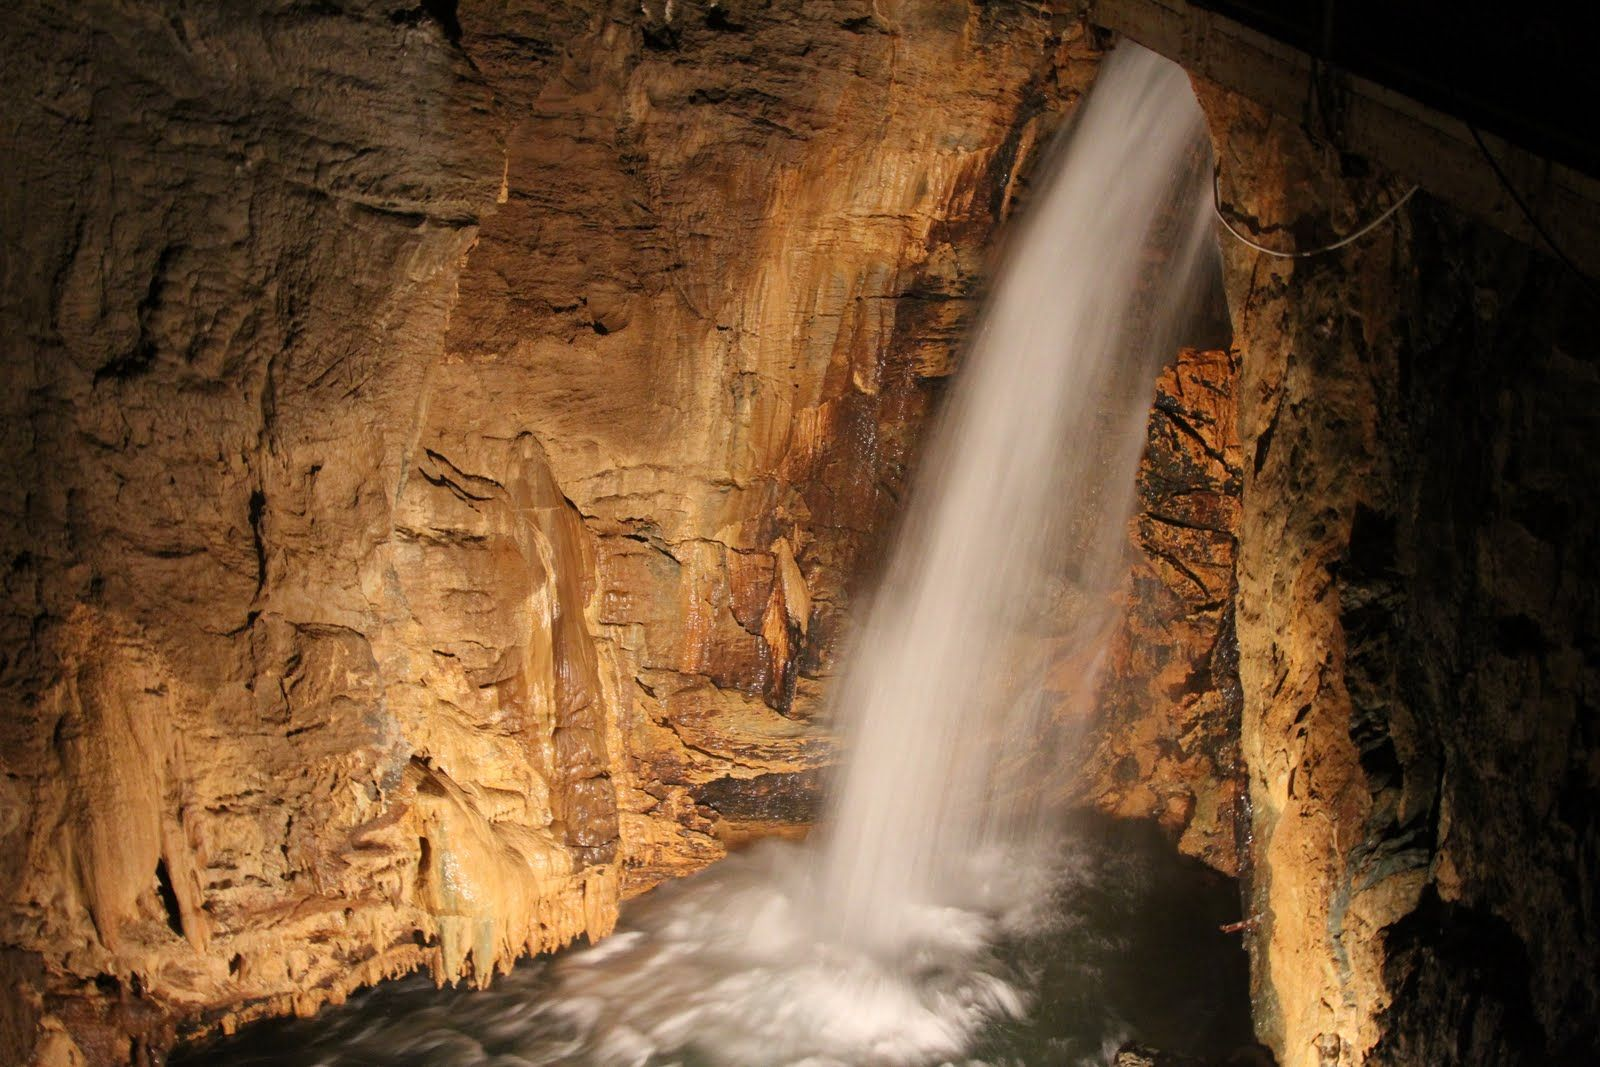 La Guida - Melodie rinascimentali in grotta